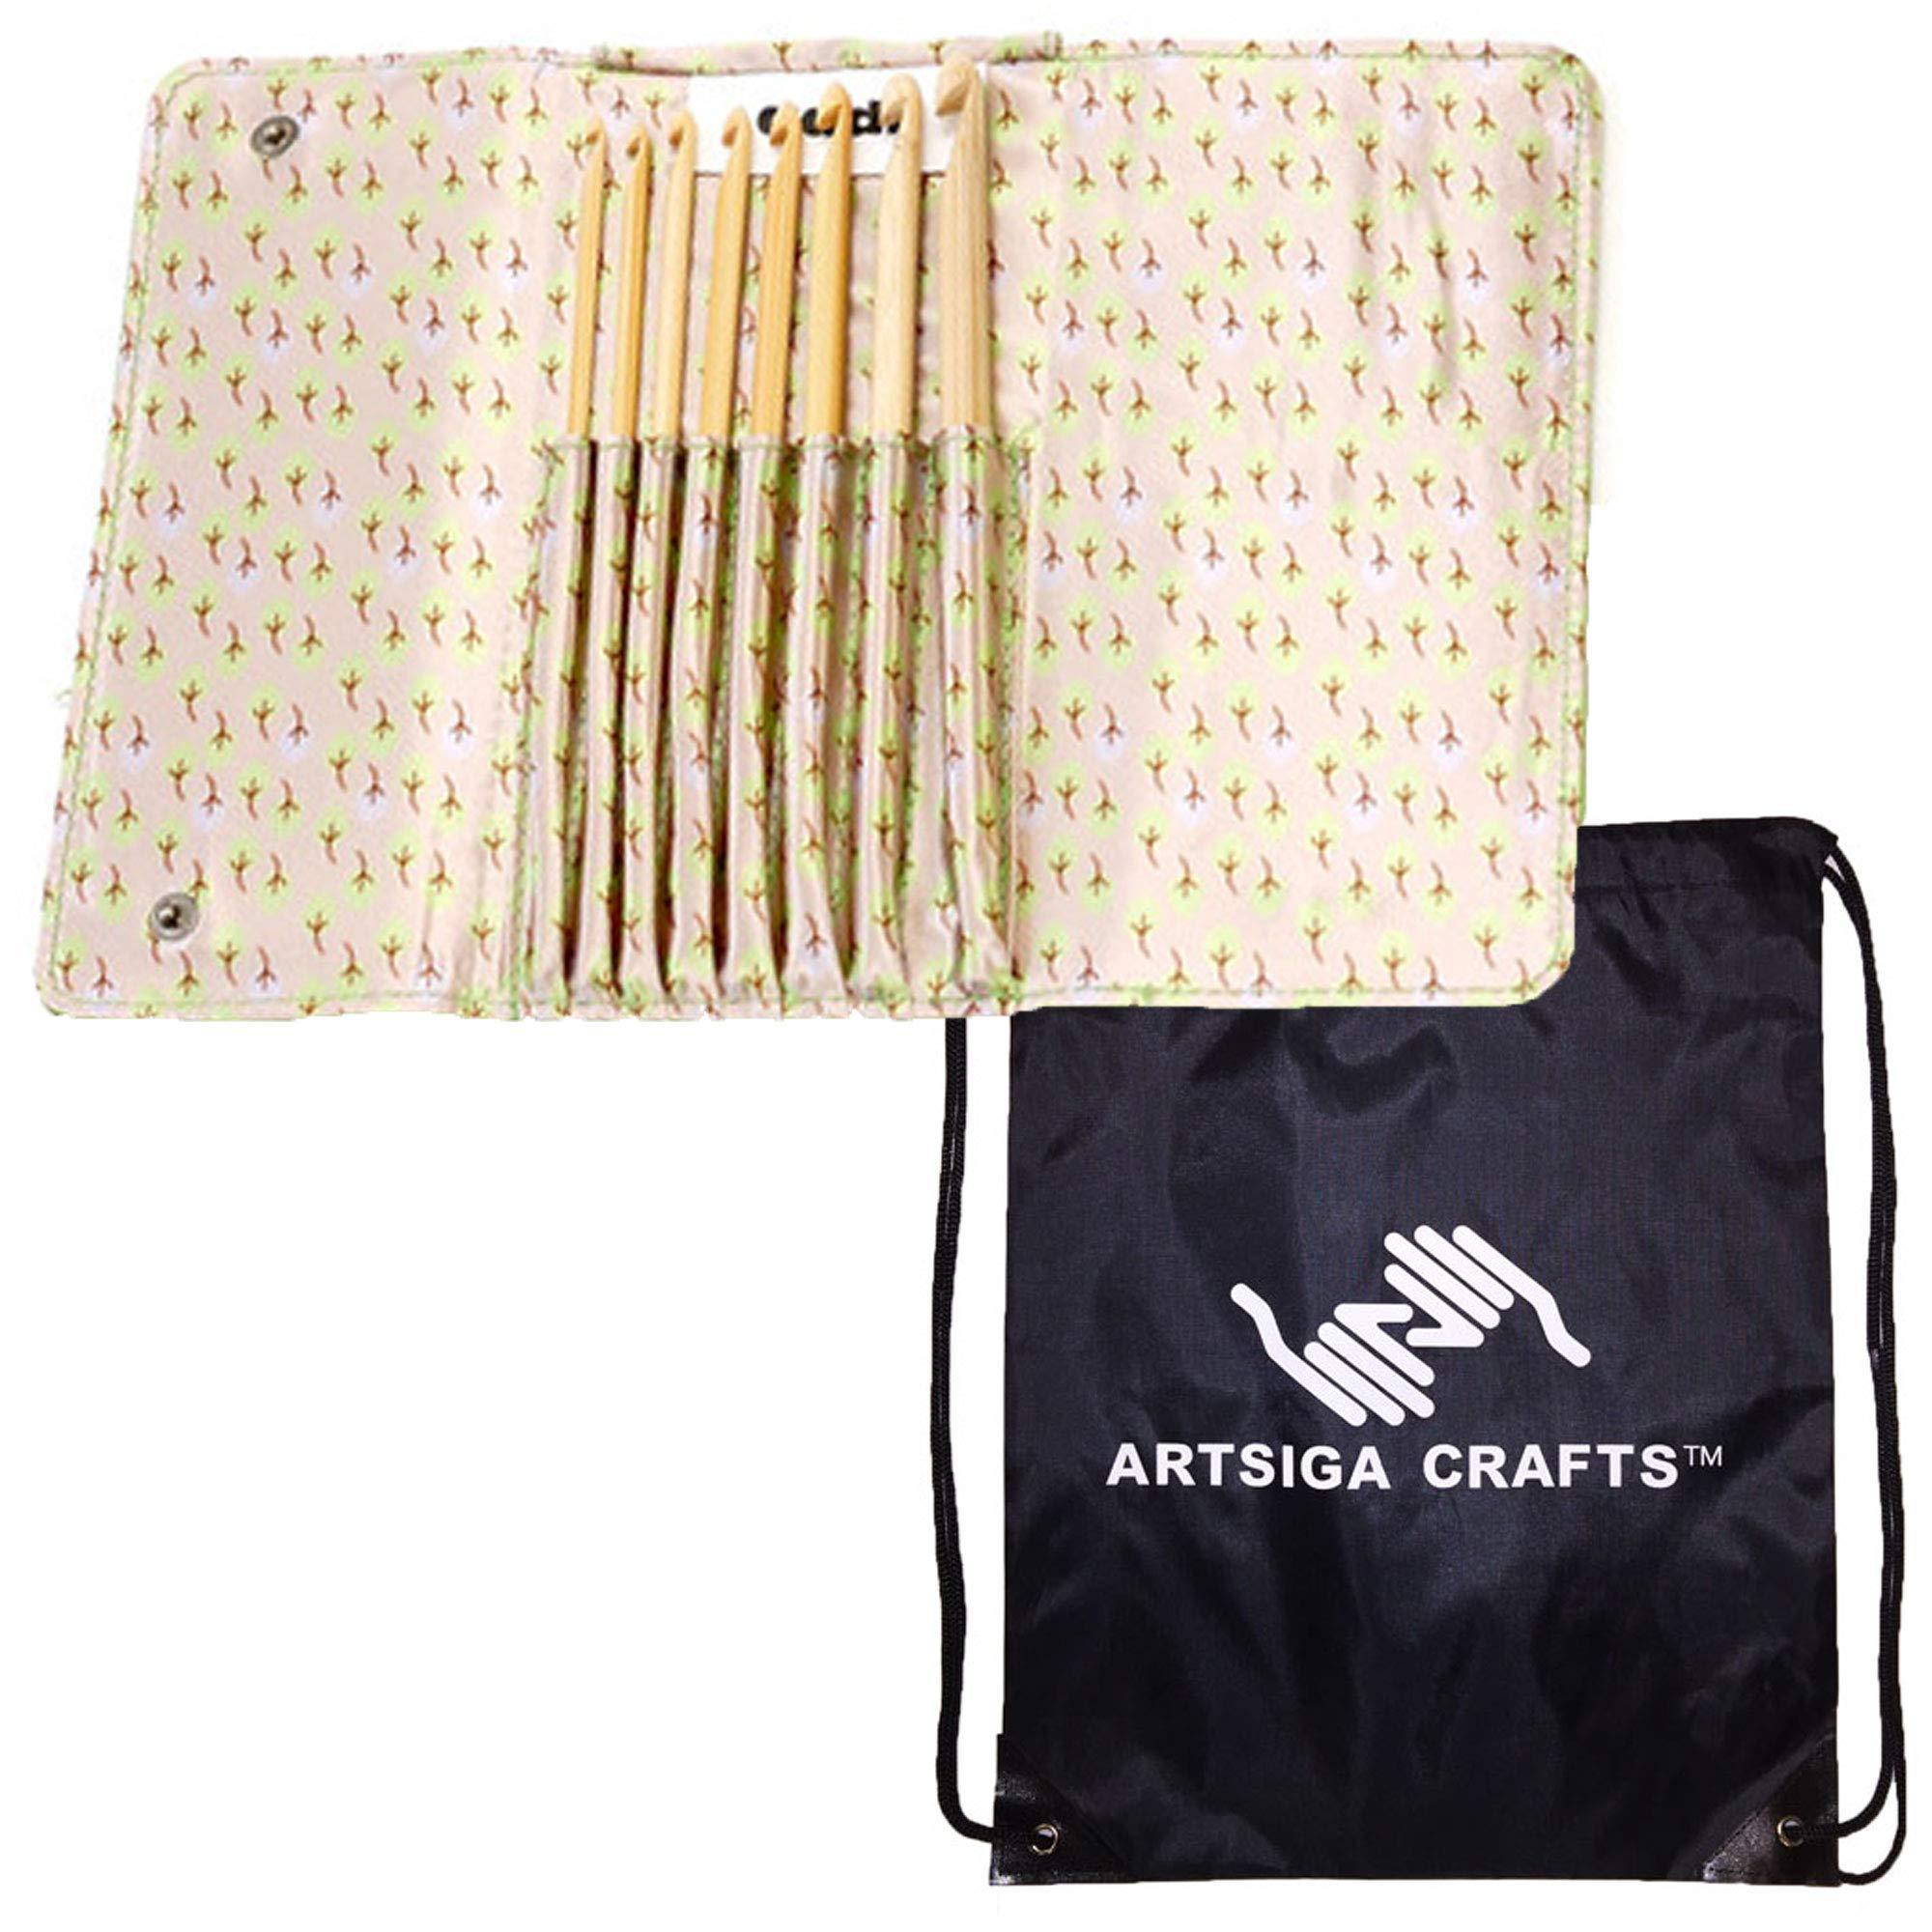 addi Knitting Needles Crochet Hook Click Bamboo Interchangeable System Bundle with 1 Artsiga Crafts Project Bag